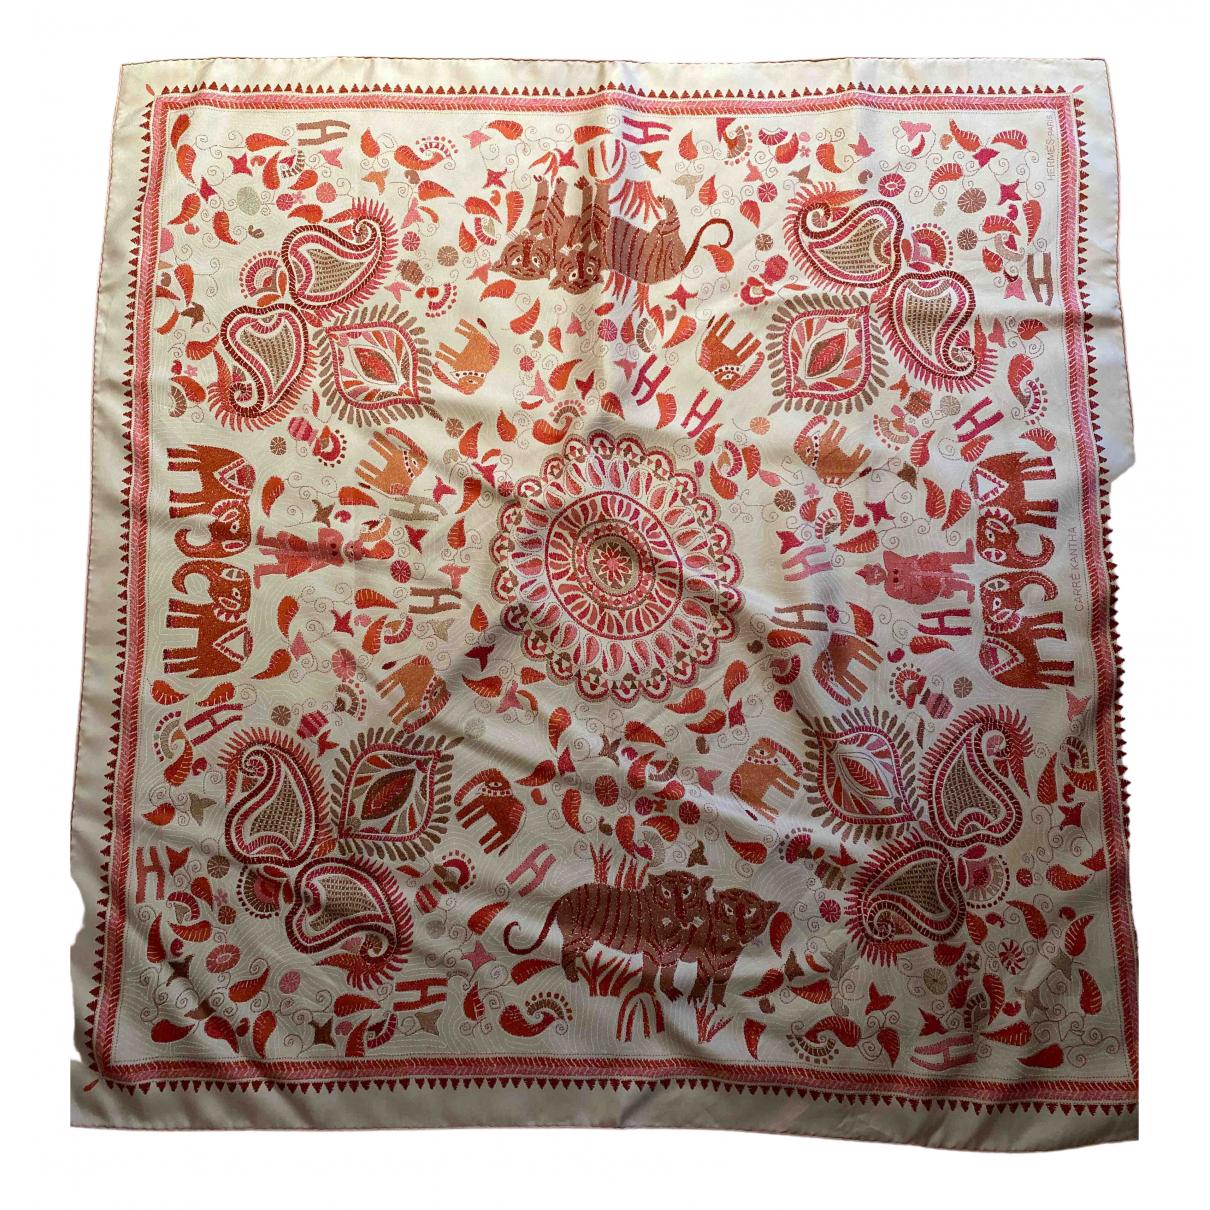 Pañuelo Carre Geant silk 140 de Seda Hermes